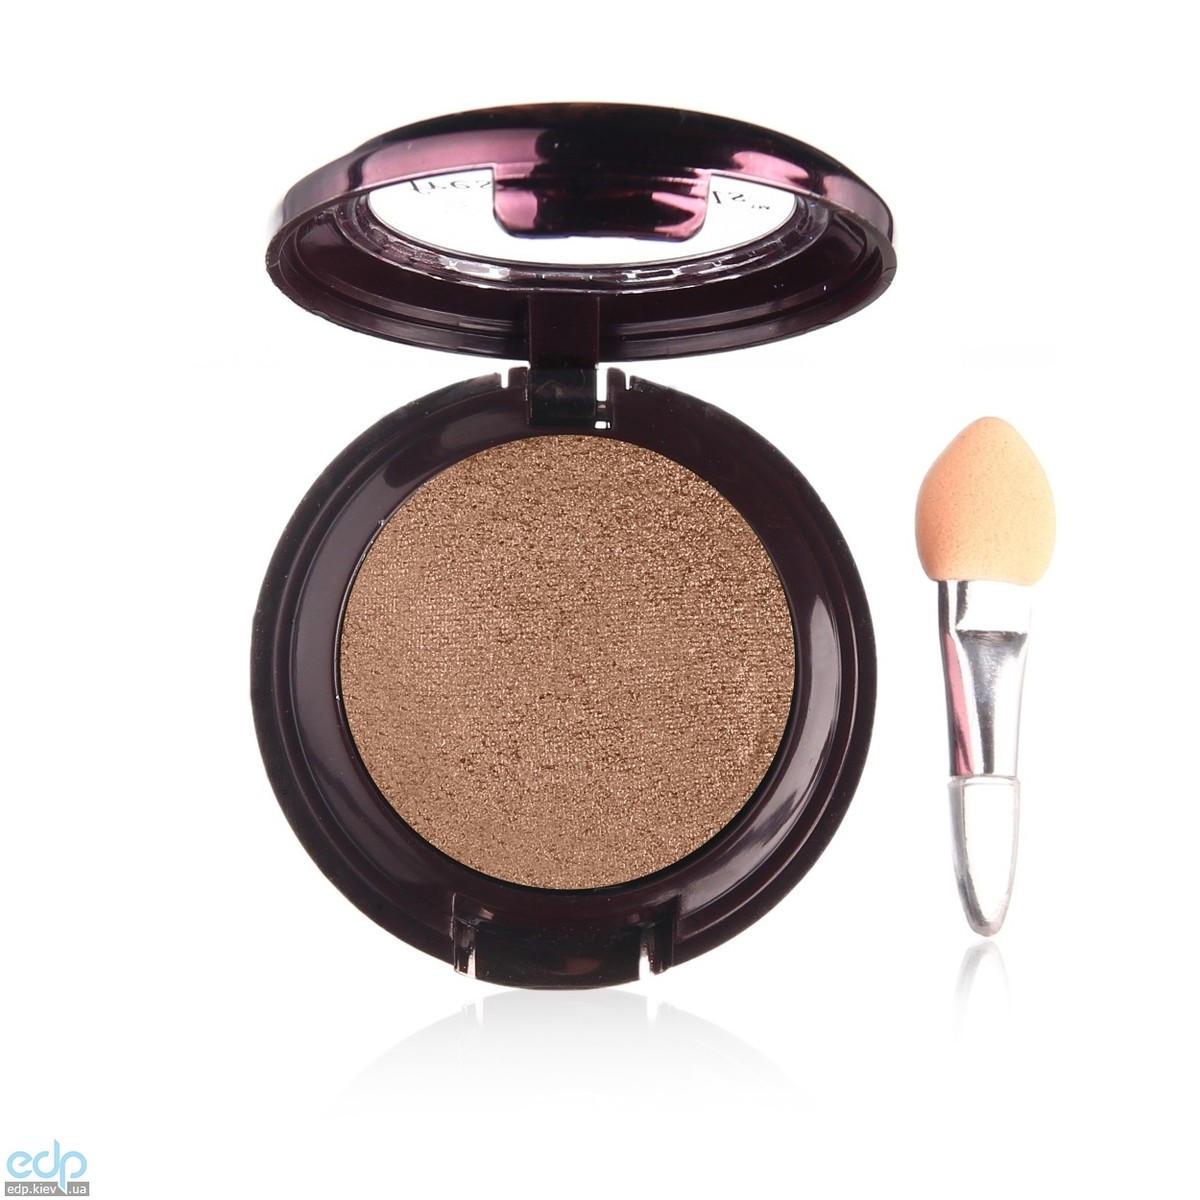 freshMinerals - Тени компактные для бровей Hotpour Eyebrow Powder Light Brown - 1.5 g